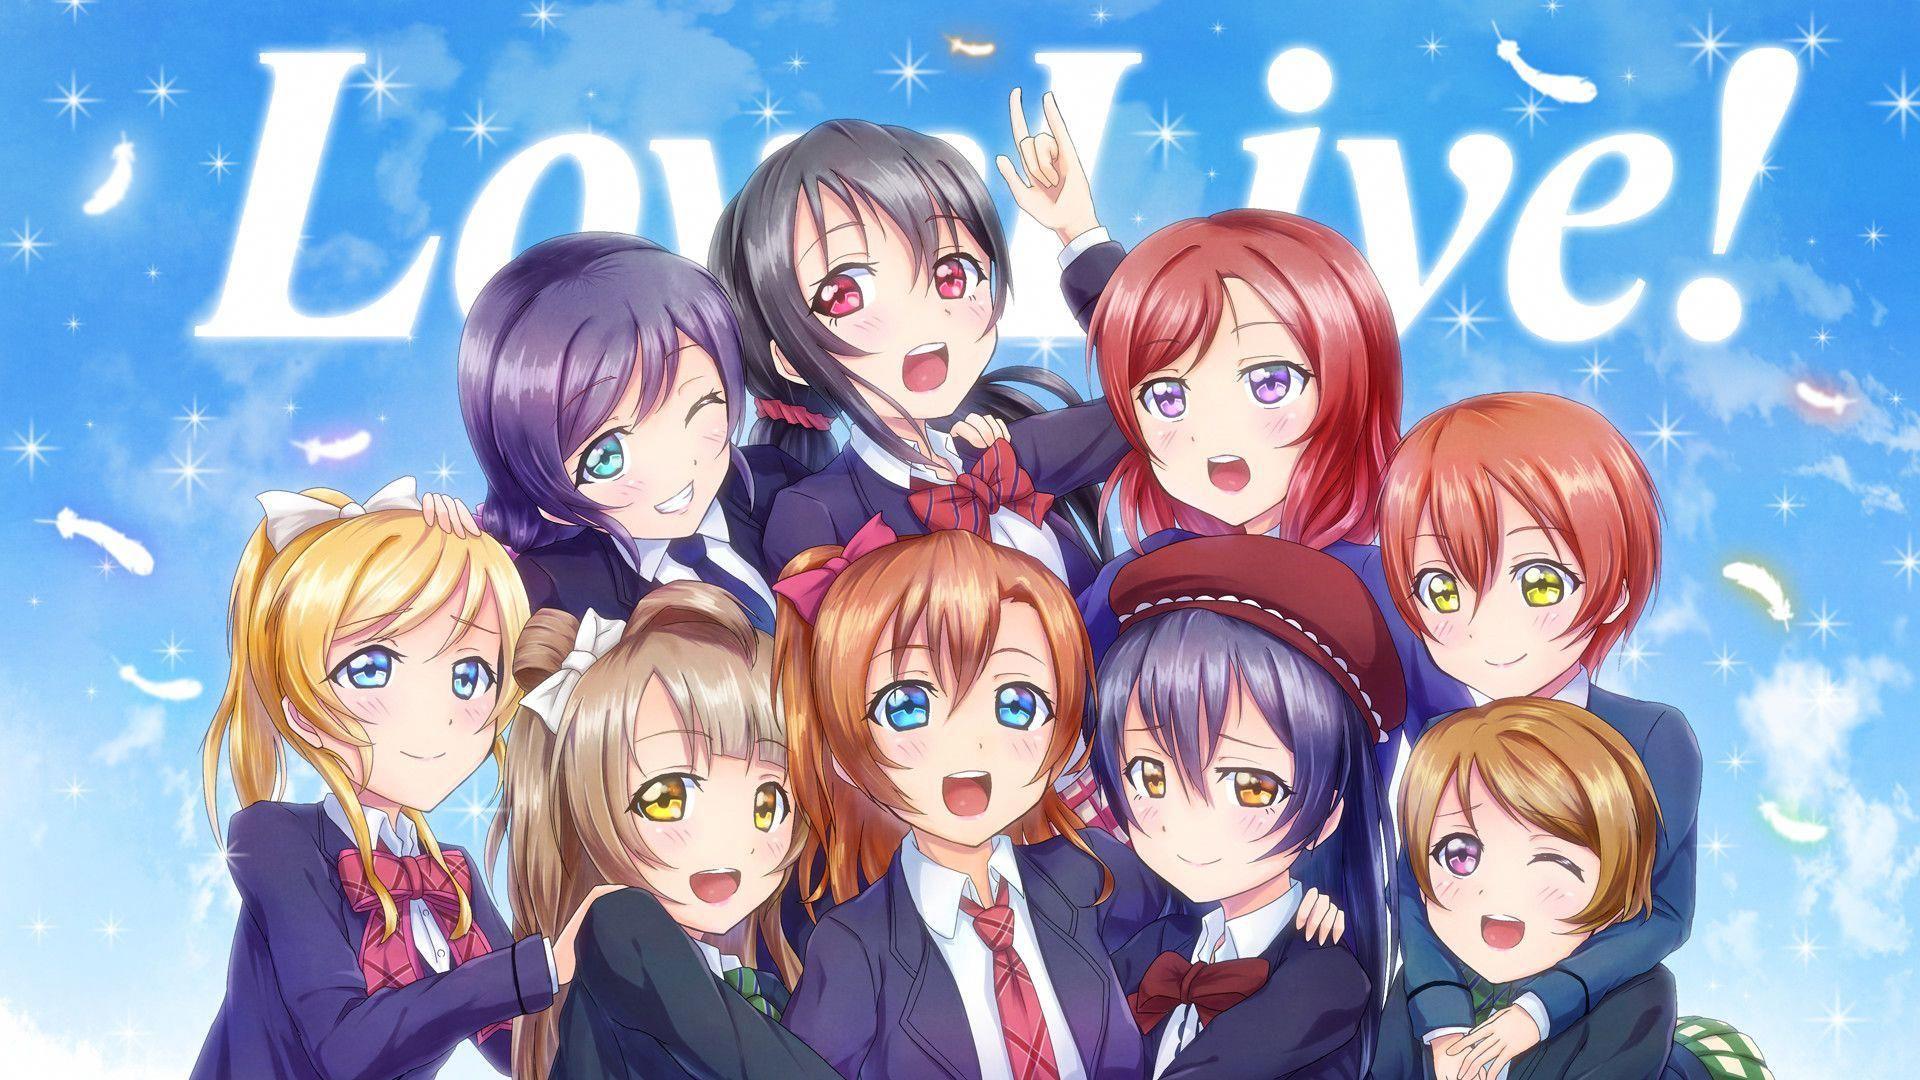 Love live wallpaper 75 images anime love anime